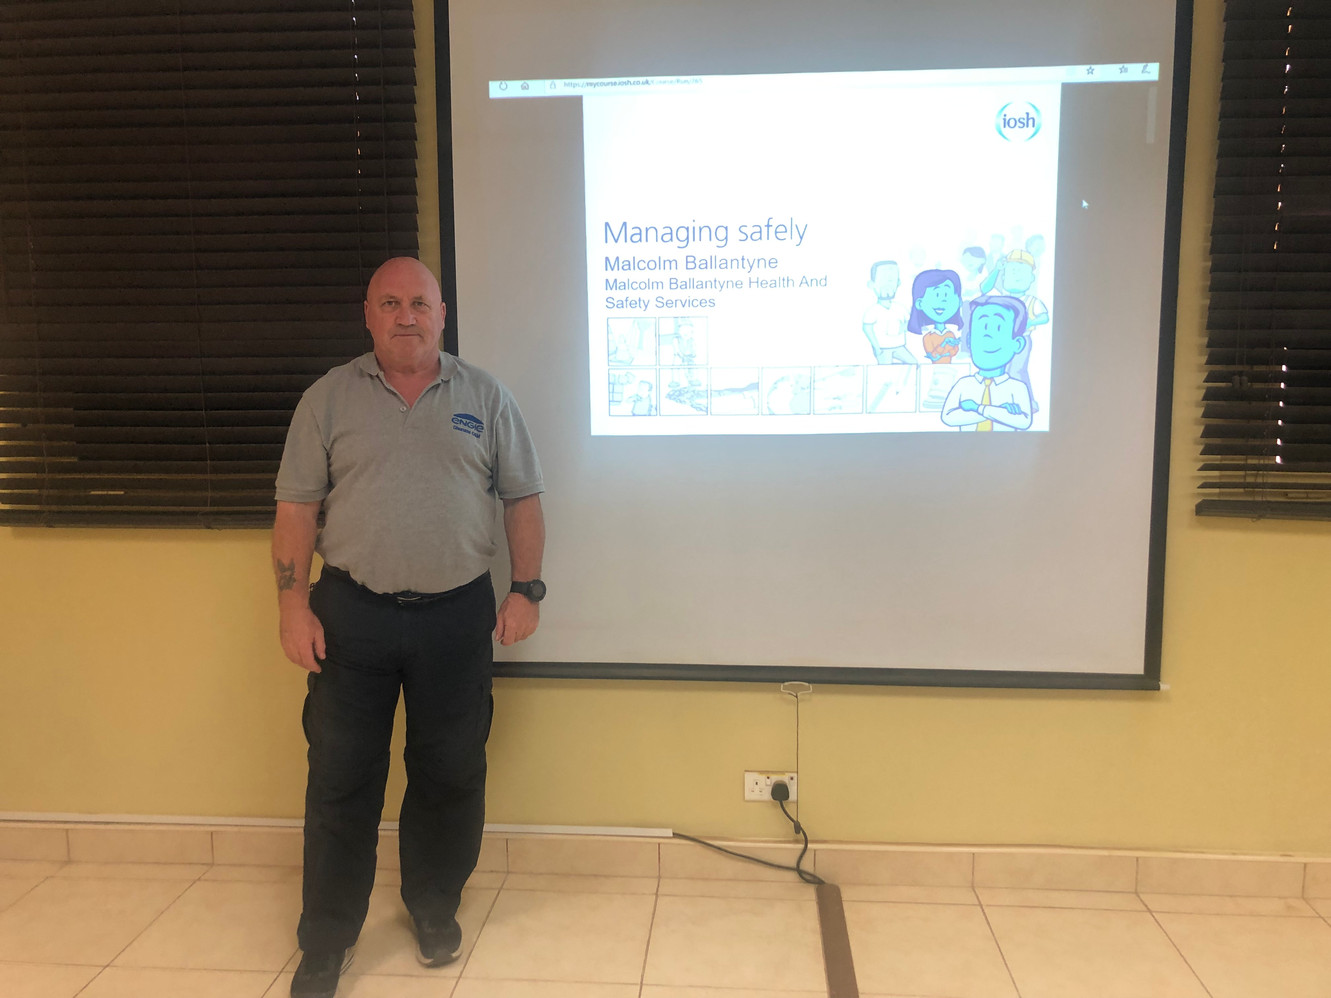 IOSH Managing Safely Training For Dhuruma O&M Company